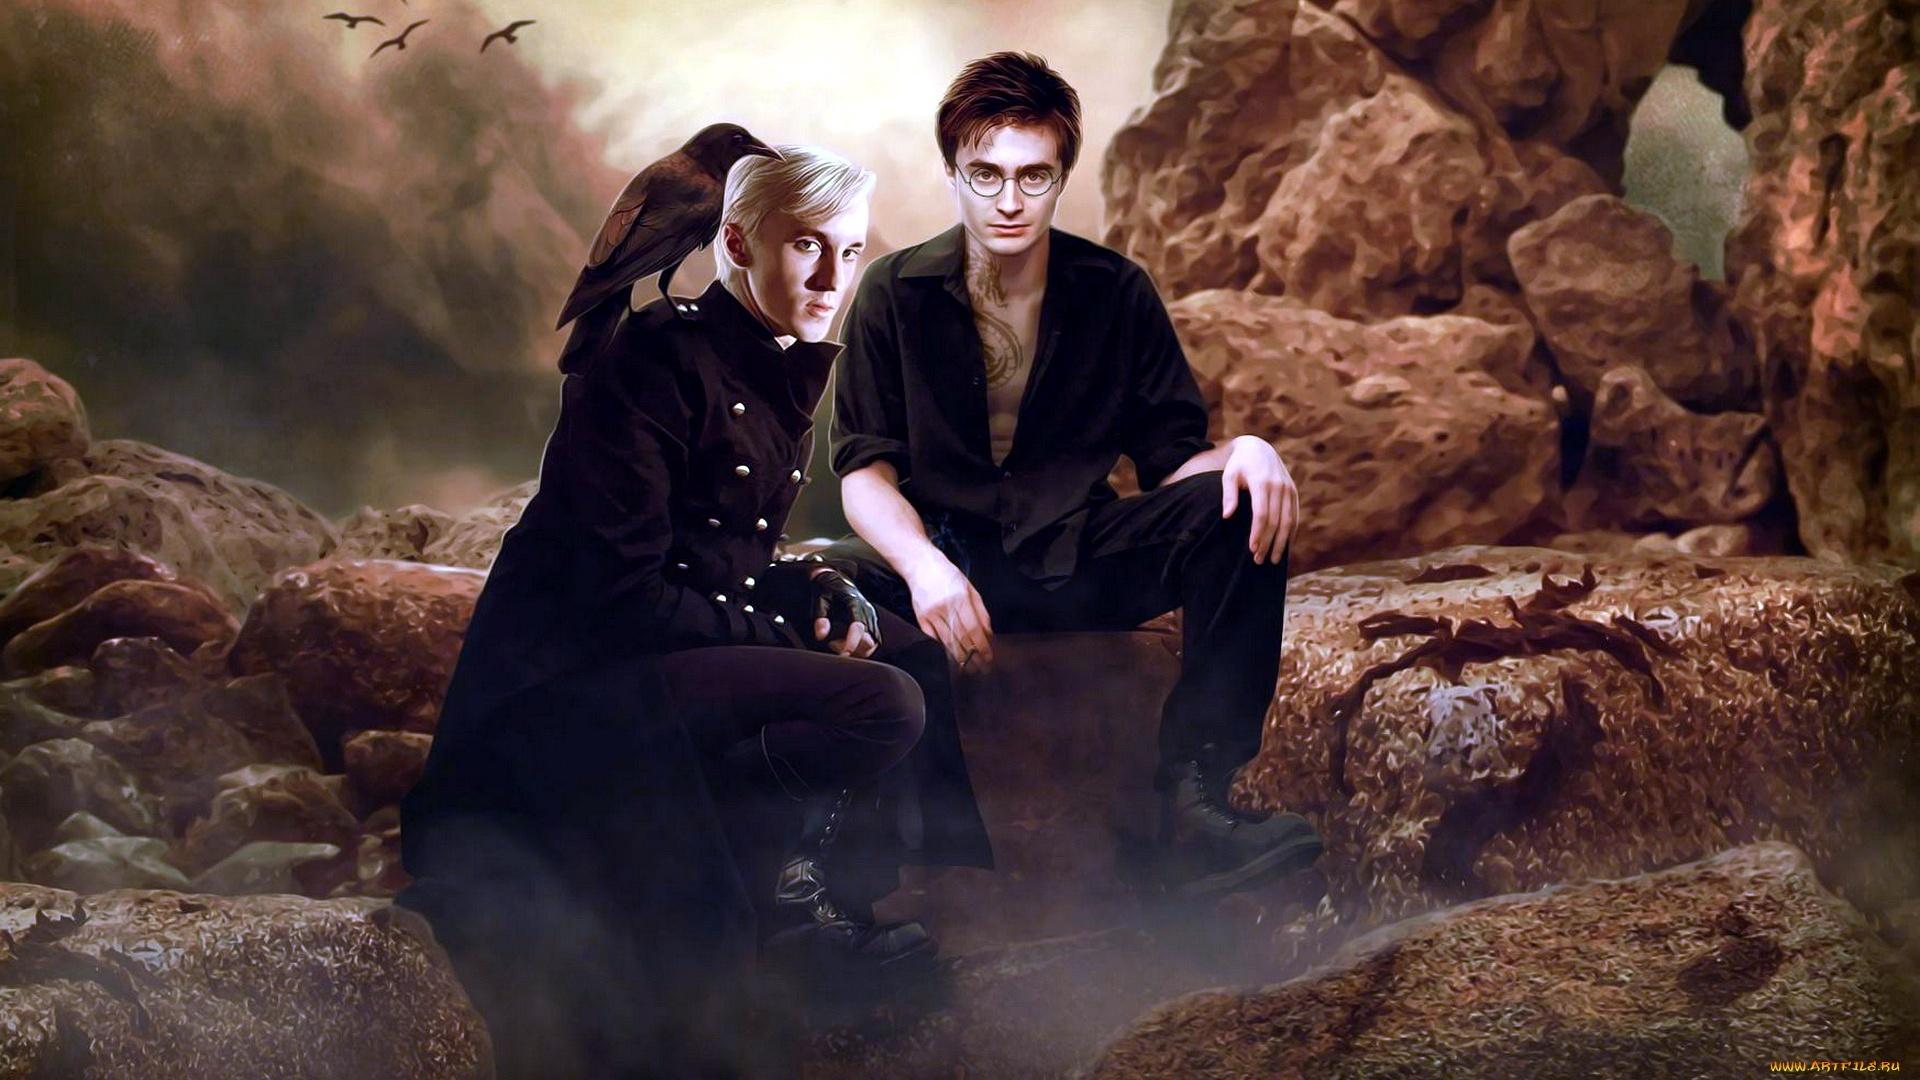 Draco Malfoy free wallpaper